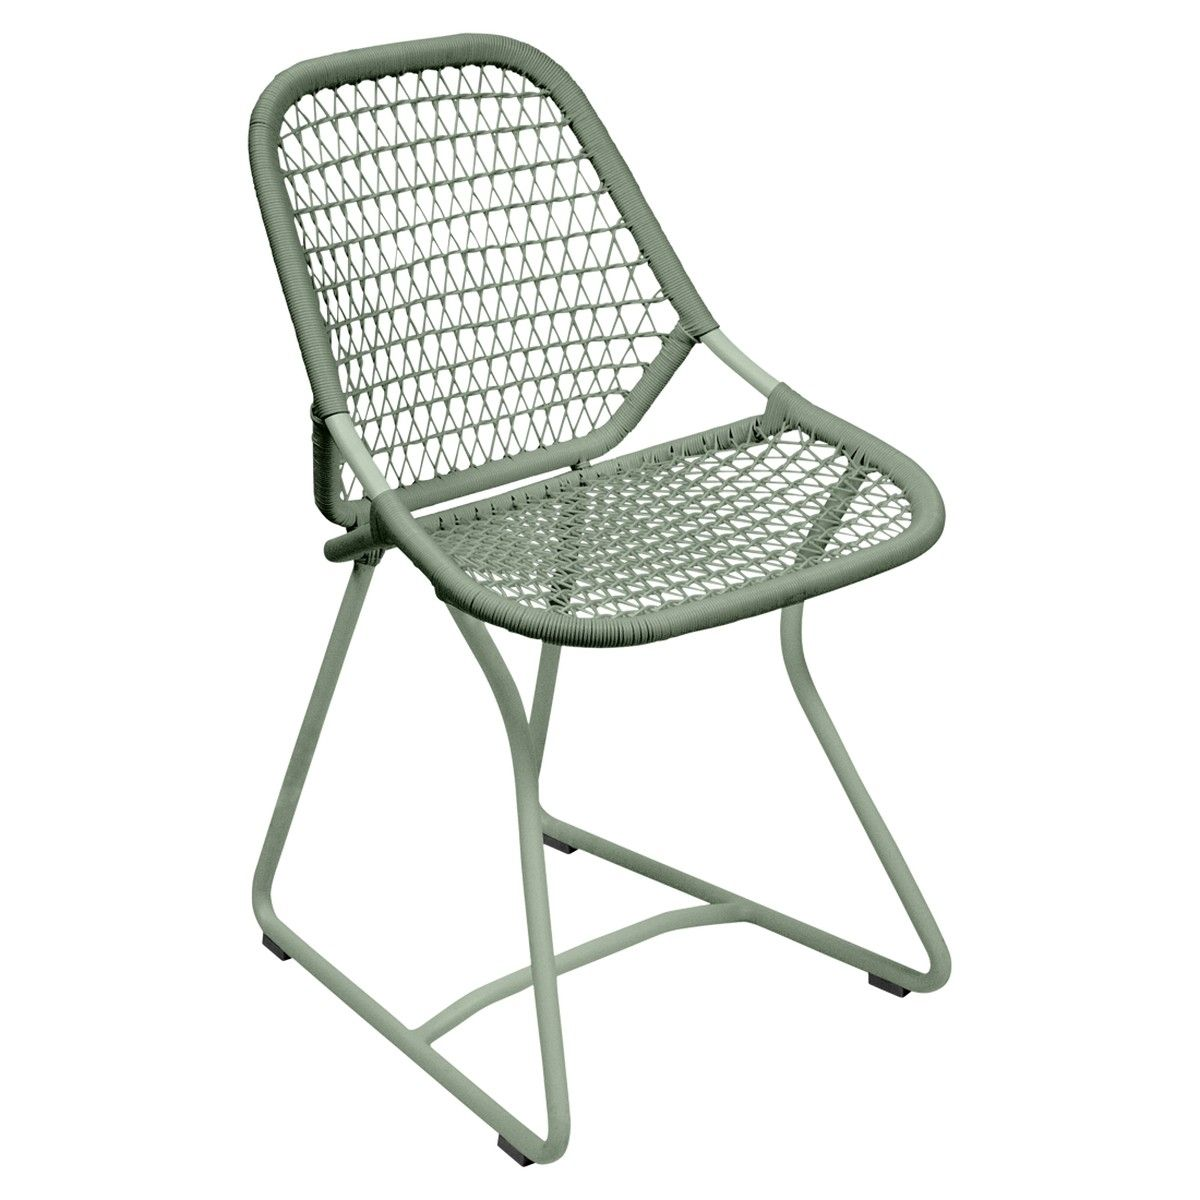 Superb Fermob Sixties Dining Chair Outdoor Furniture Jardin Nz Lamtechconsult Wood Chair Design Ideas Lamtechconsultcom